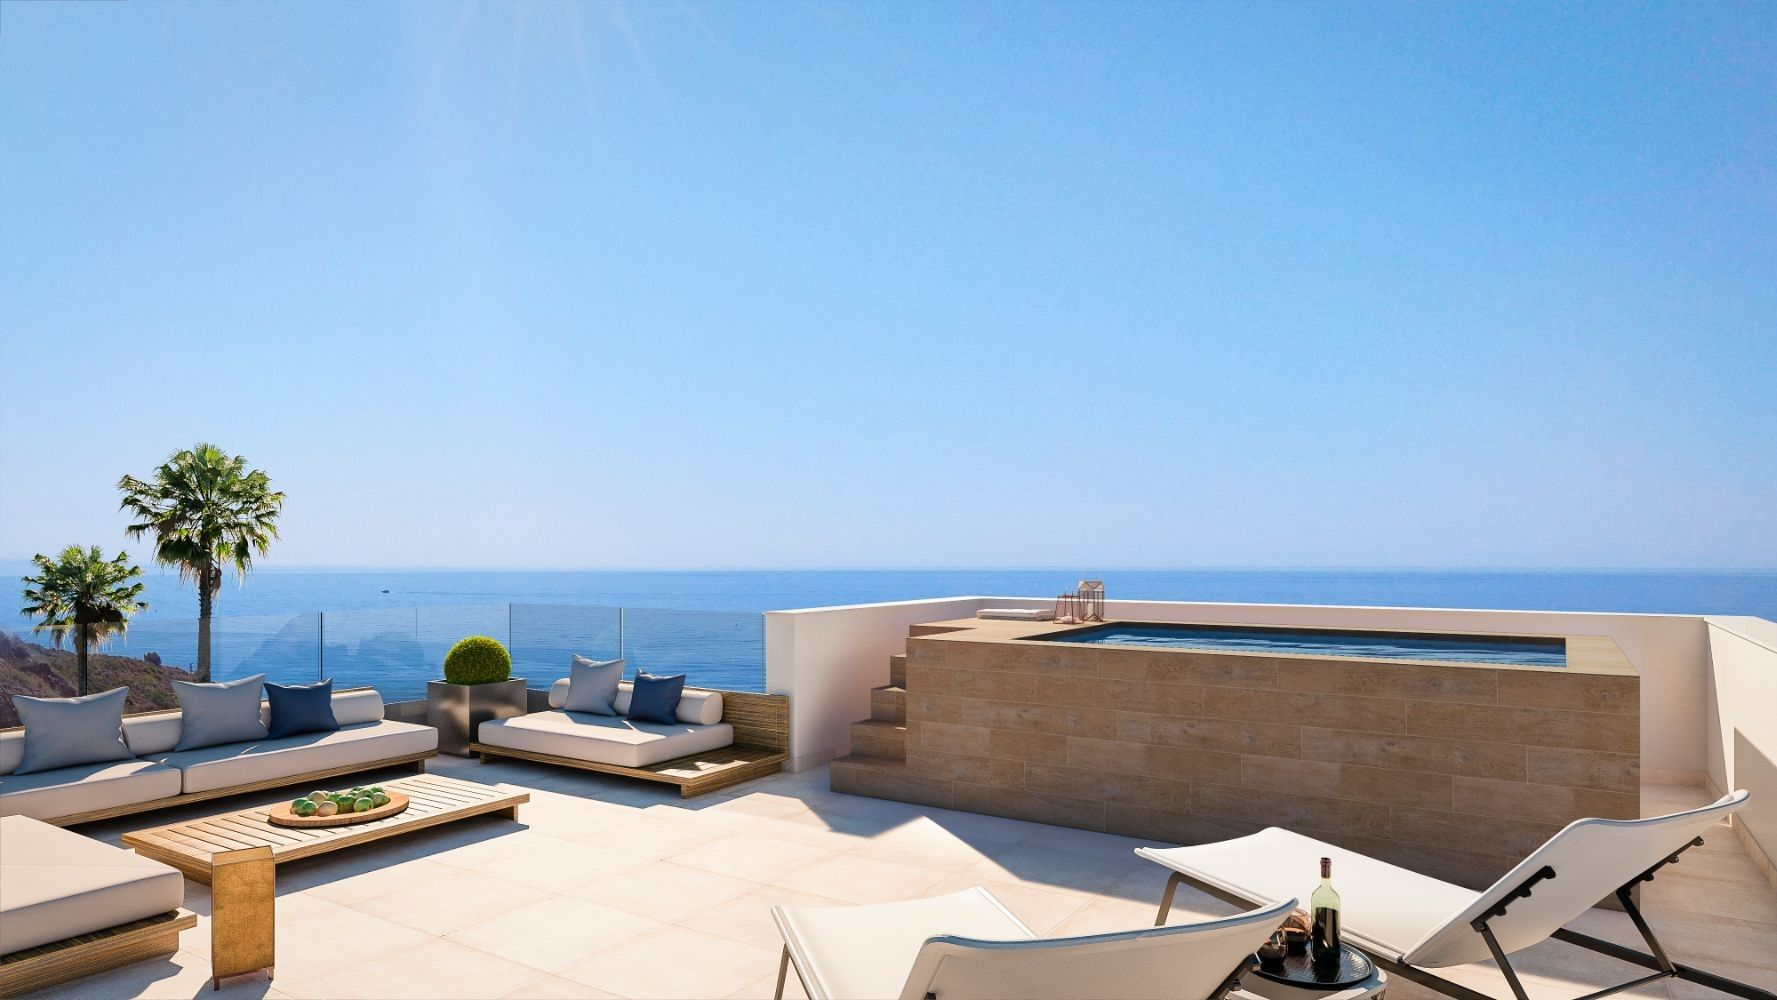 Paradise penthouse in Fuengirola | Christie's International Real Estate